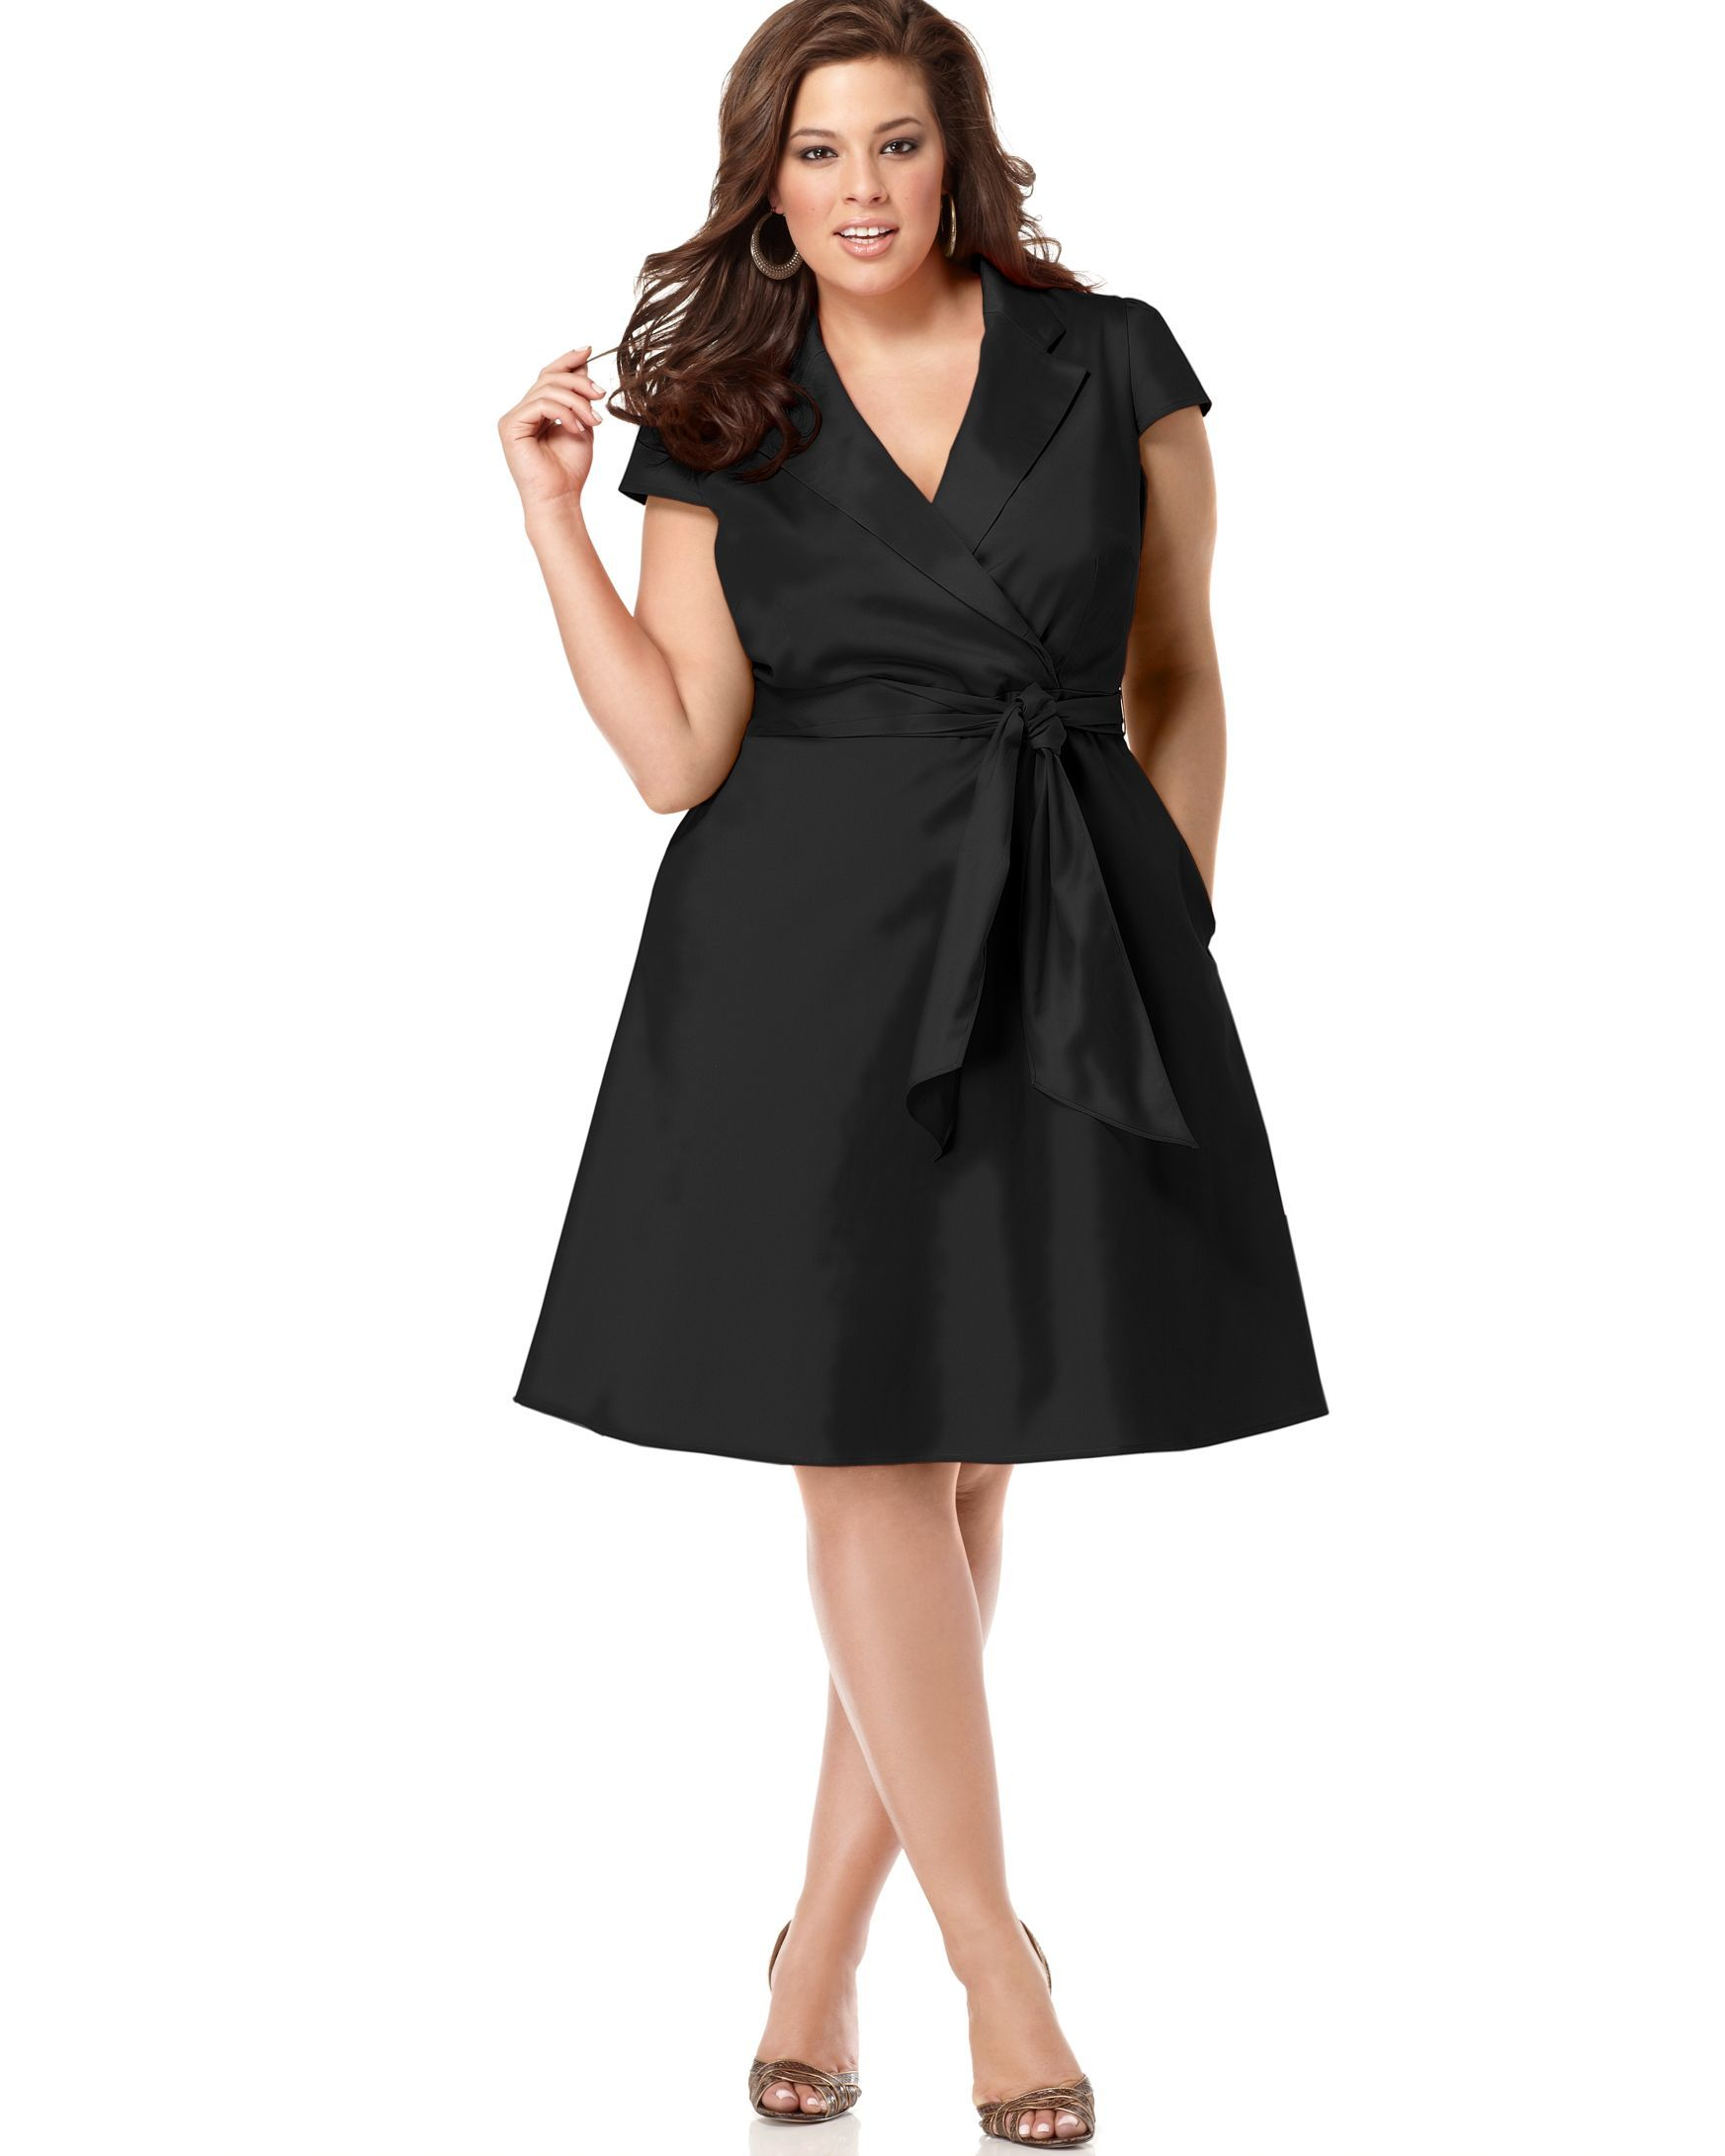 af9eca47a02 Spense Plus Size Dress